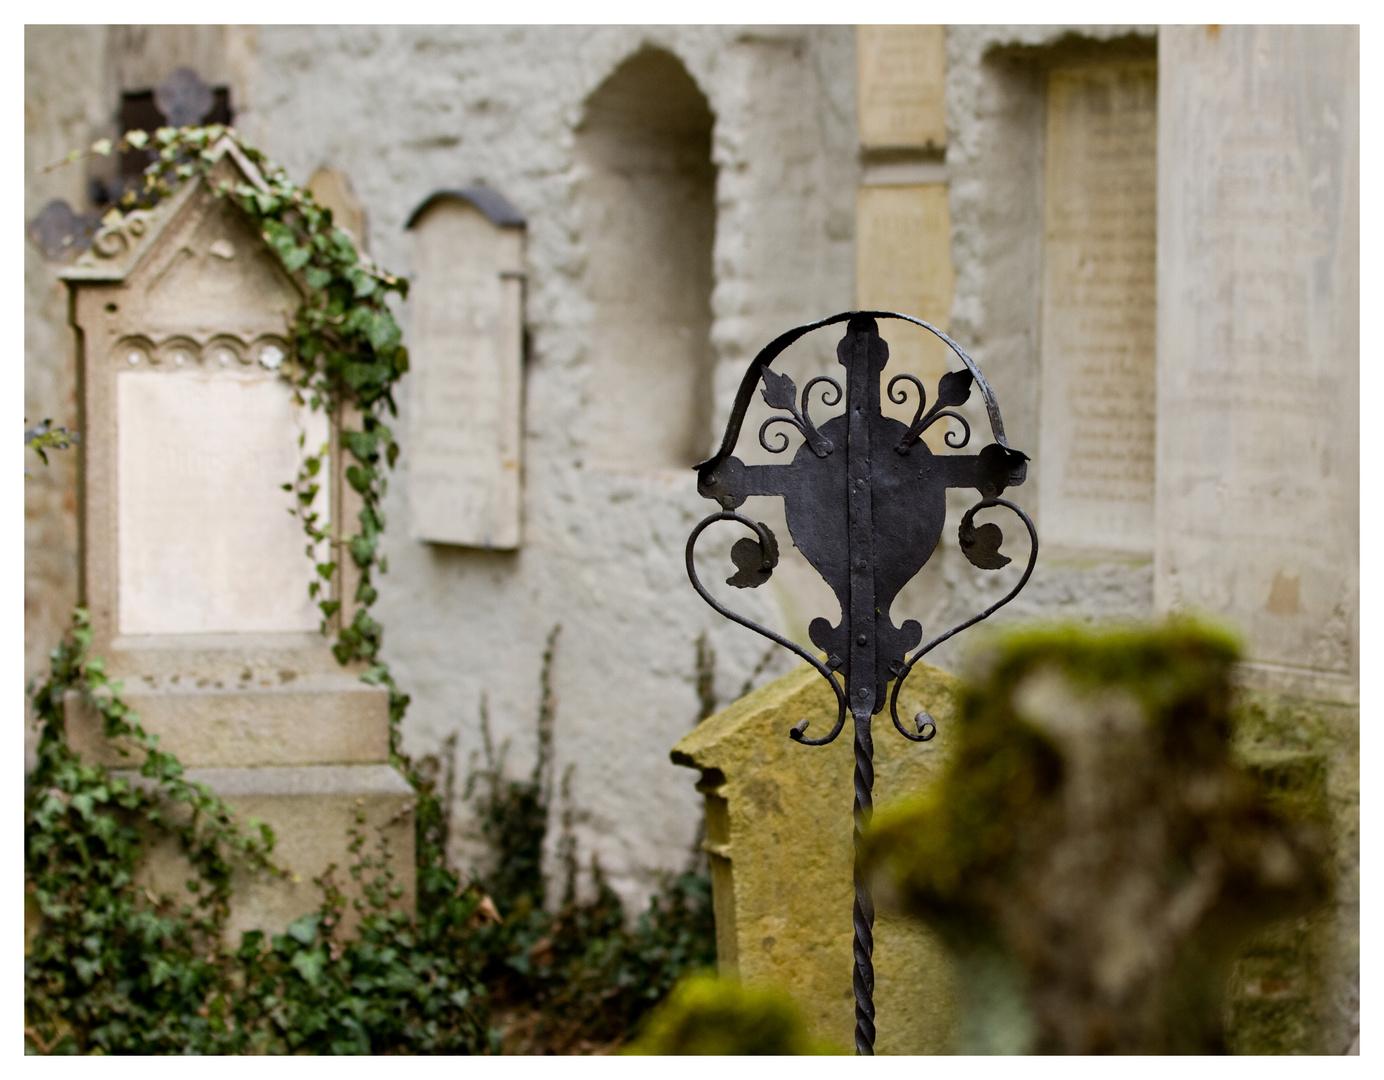 Friedhof St. Peter in Straubing